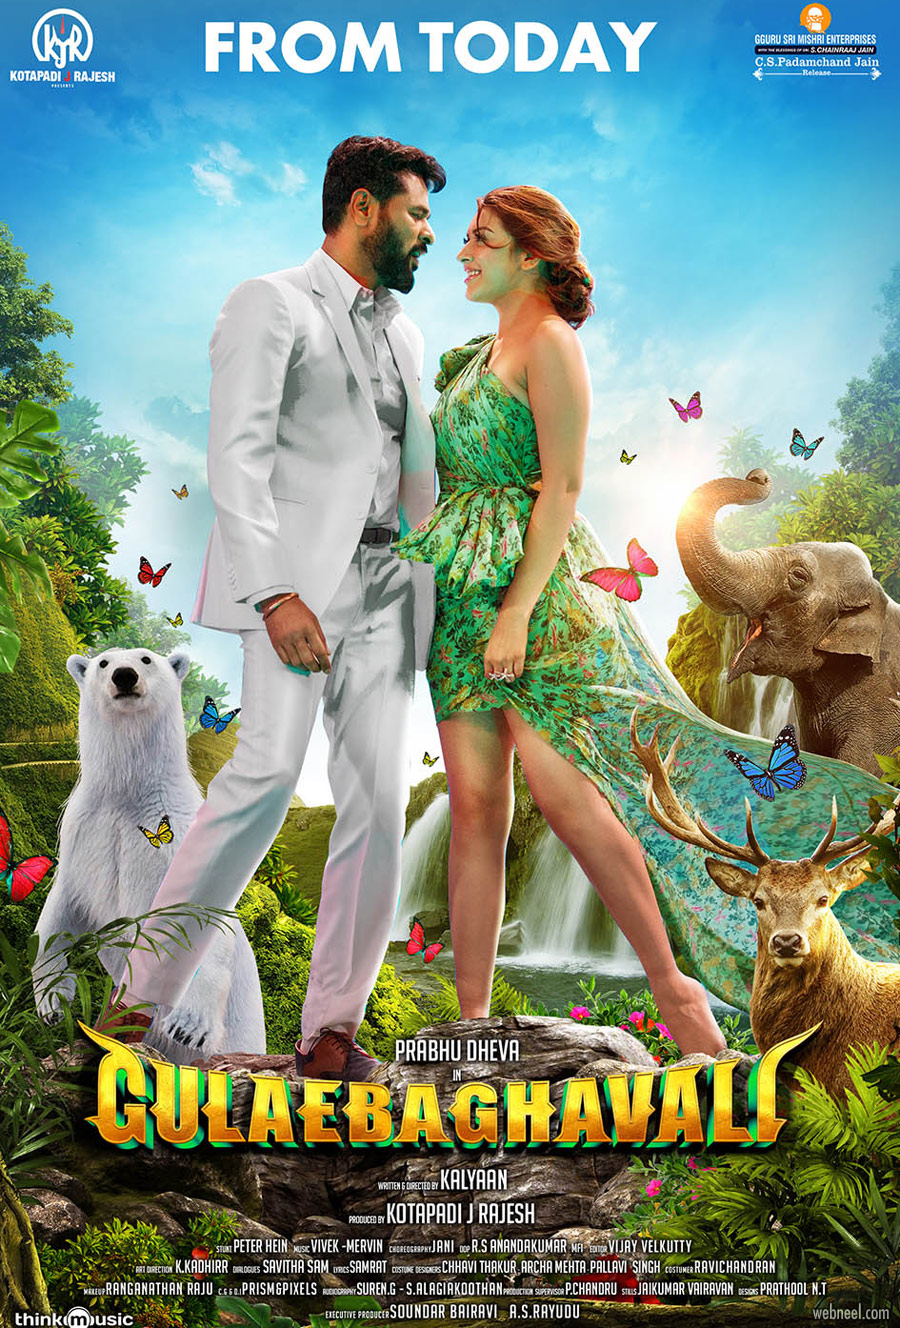 movie poster design india tamil gulebakavali by prathoolnt